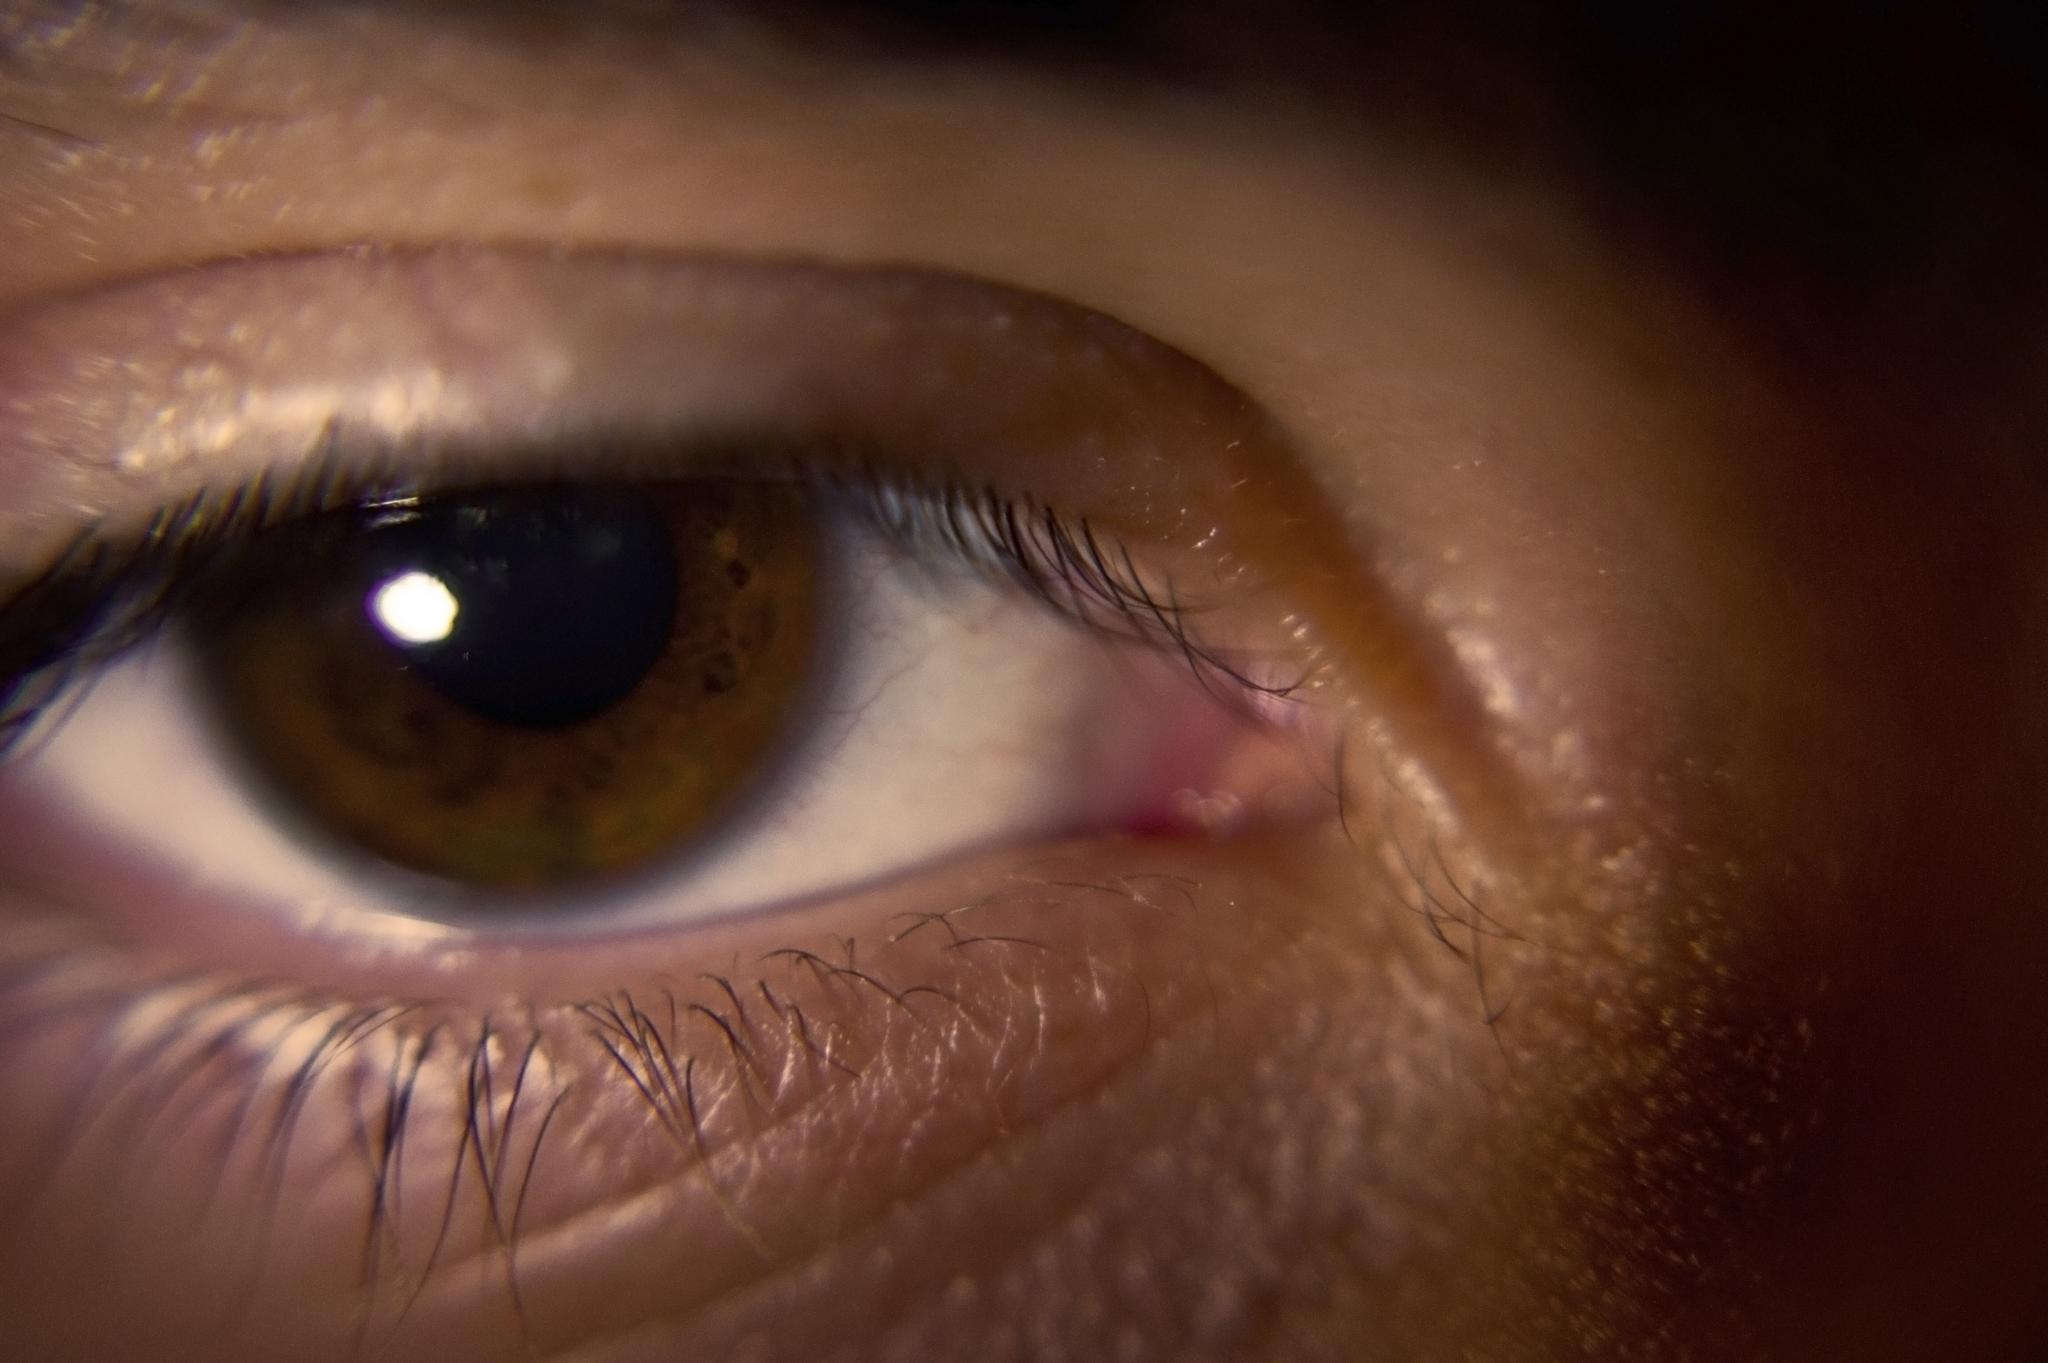 The Human Eye by Austin Devine